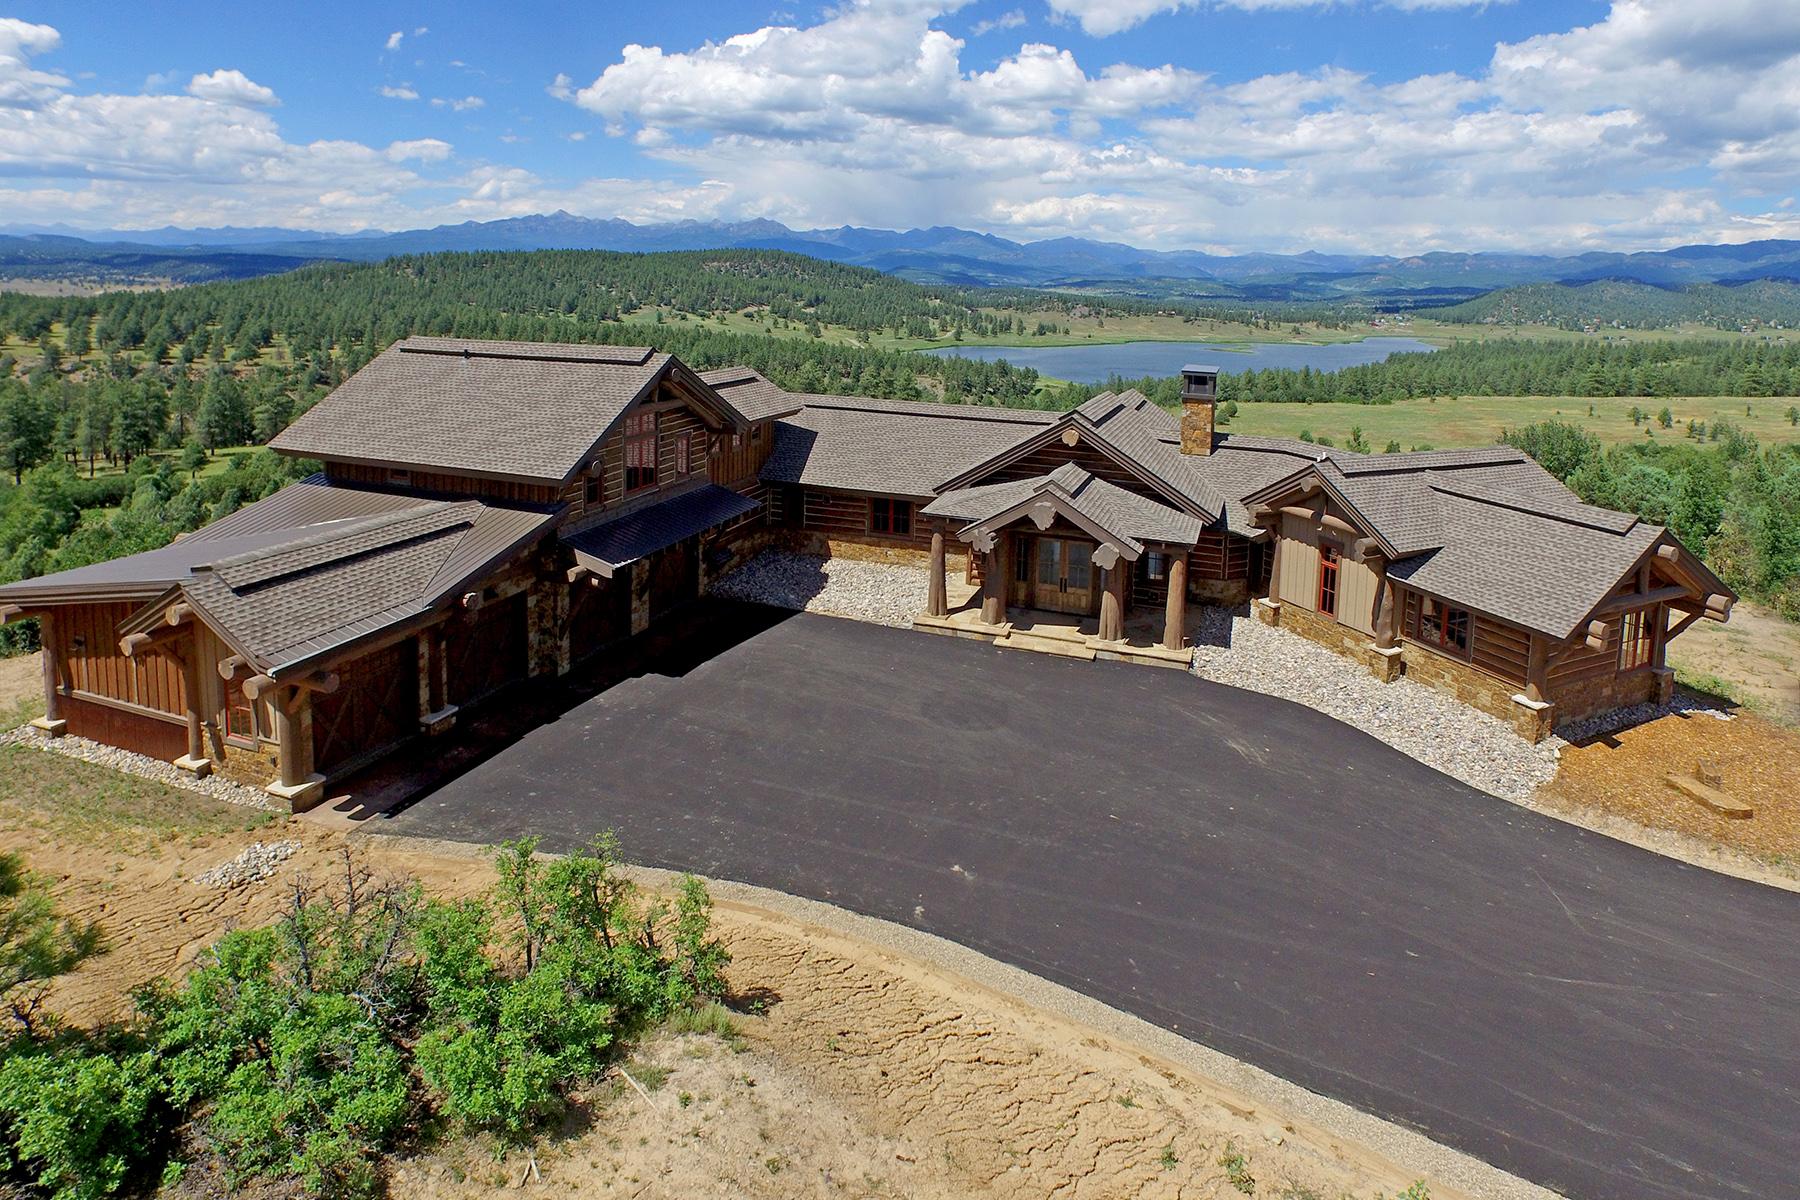 Single Family Home for Sale at Echo Lake Lodge 1515 Echo Canyon Ranch Lane Echo Lake Lodge Pagosa Springs, Colorado 81147 United States